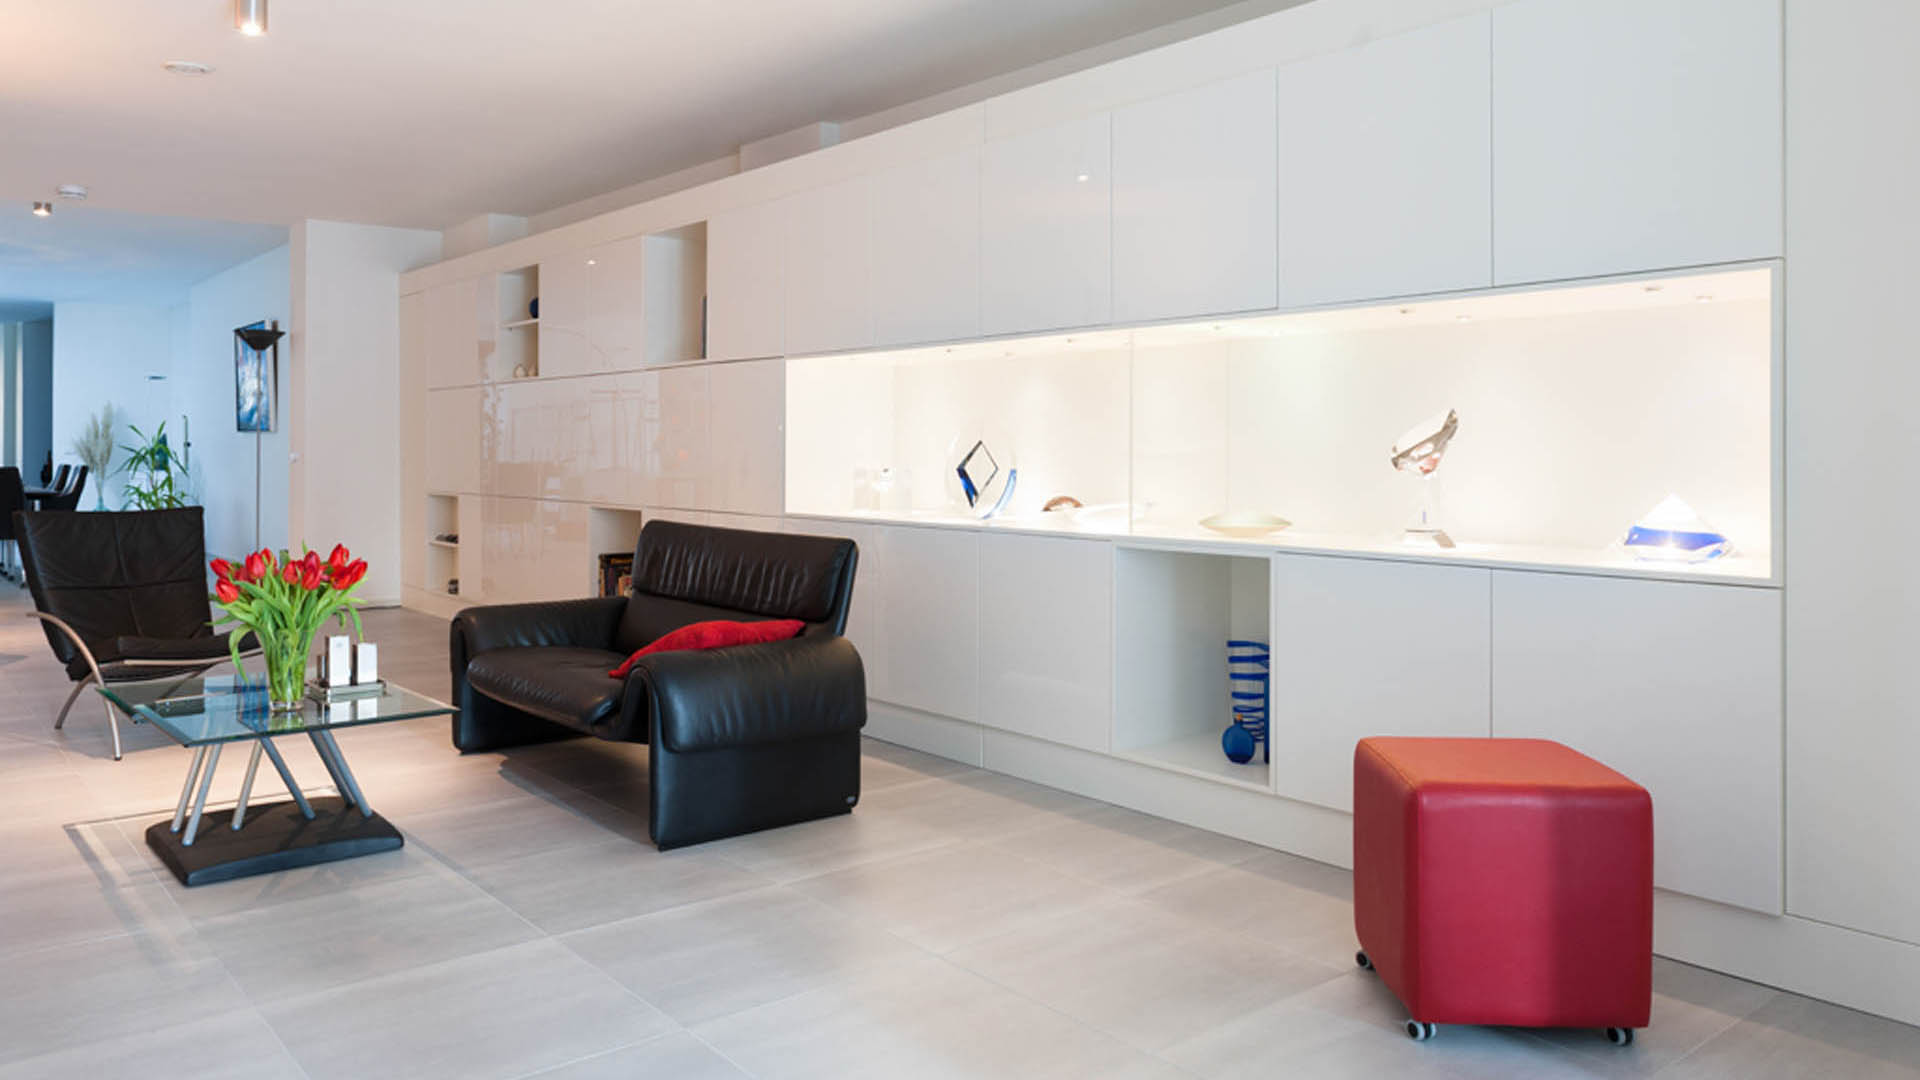 Architectuur delft renovatie interieur transformatie 12 studio d11 - Architectuur renovatie ...